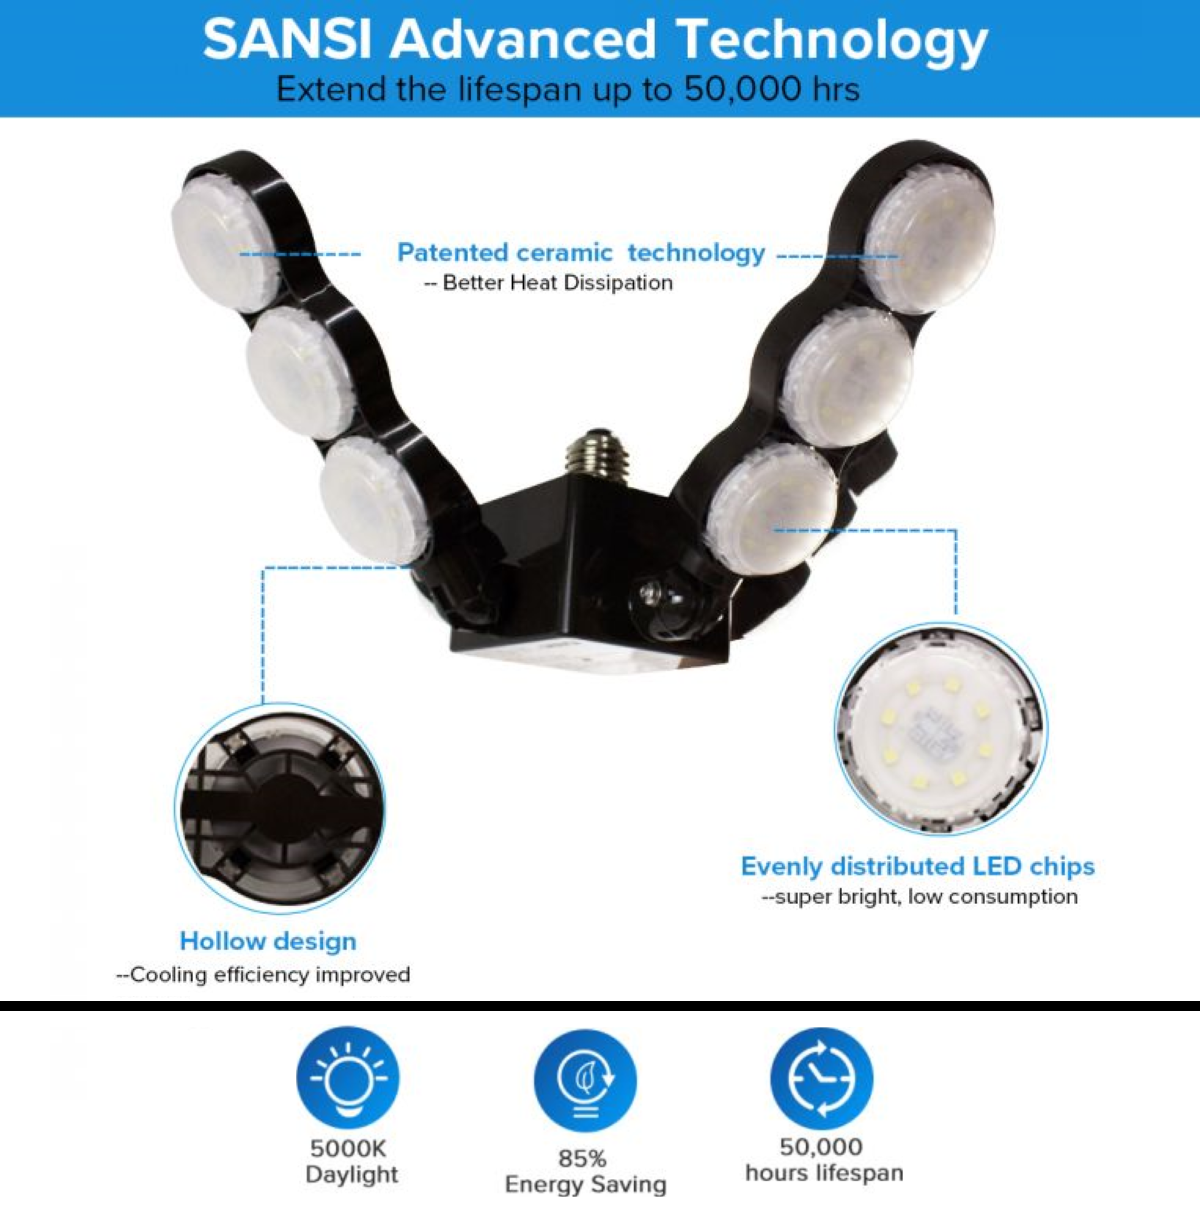 SANSI Ceiling Light - Advanced Heat Dissipation Technology